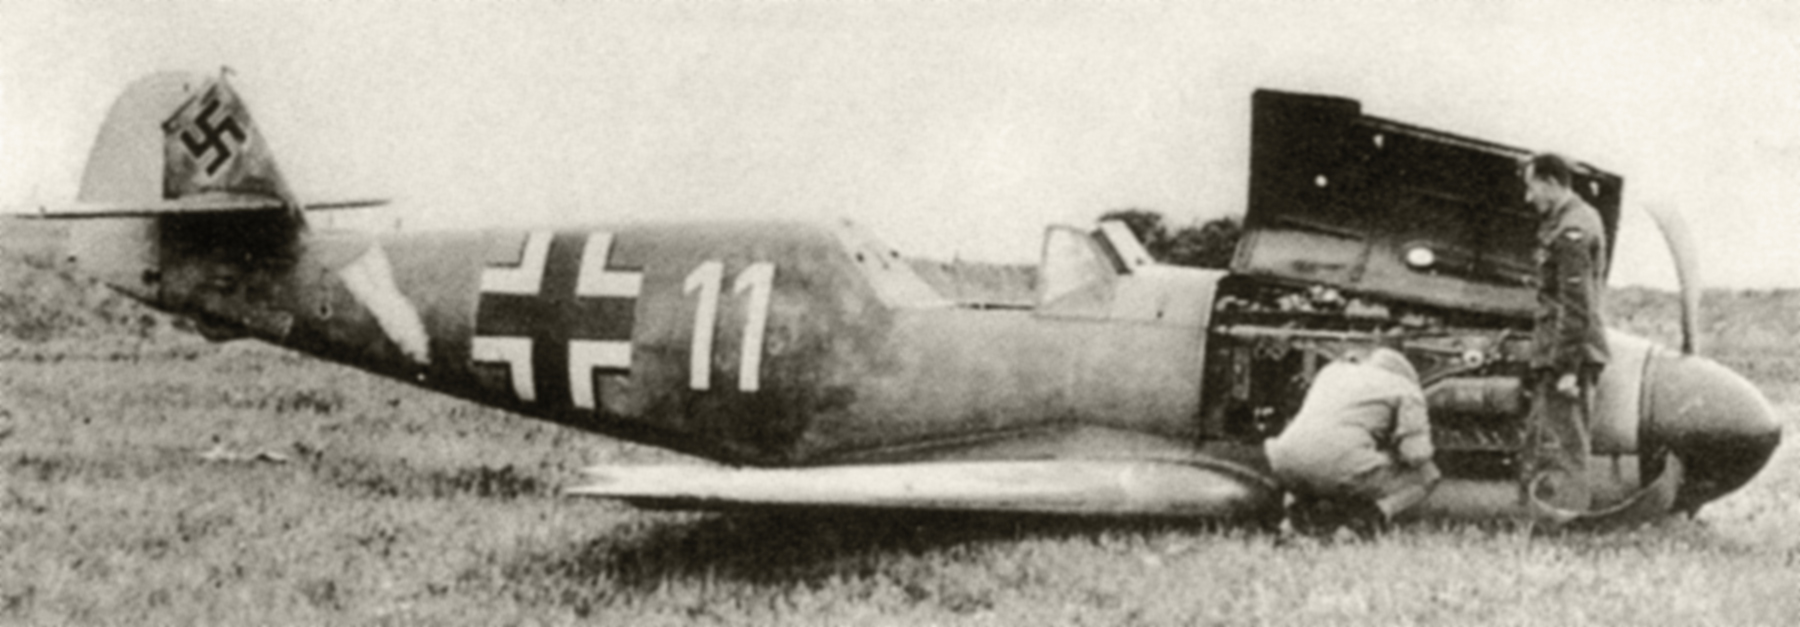 Messerschmitt Bf 109F4B 10.JG26 White 11 Oswald Fischer WNr 7232 crash landed England 1942 02